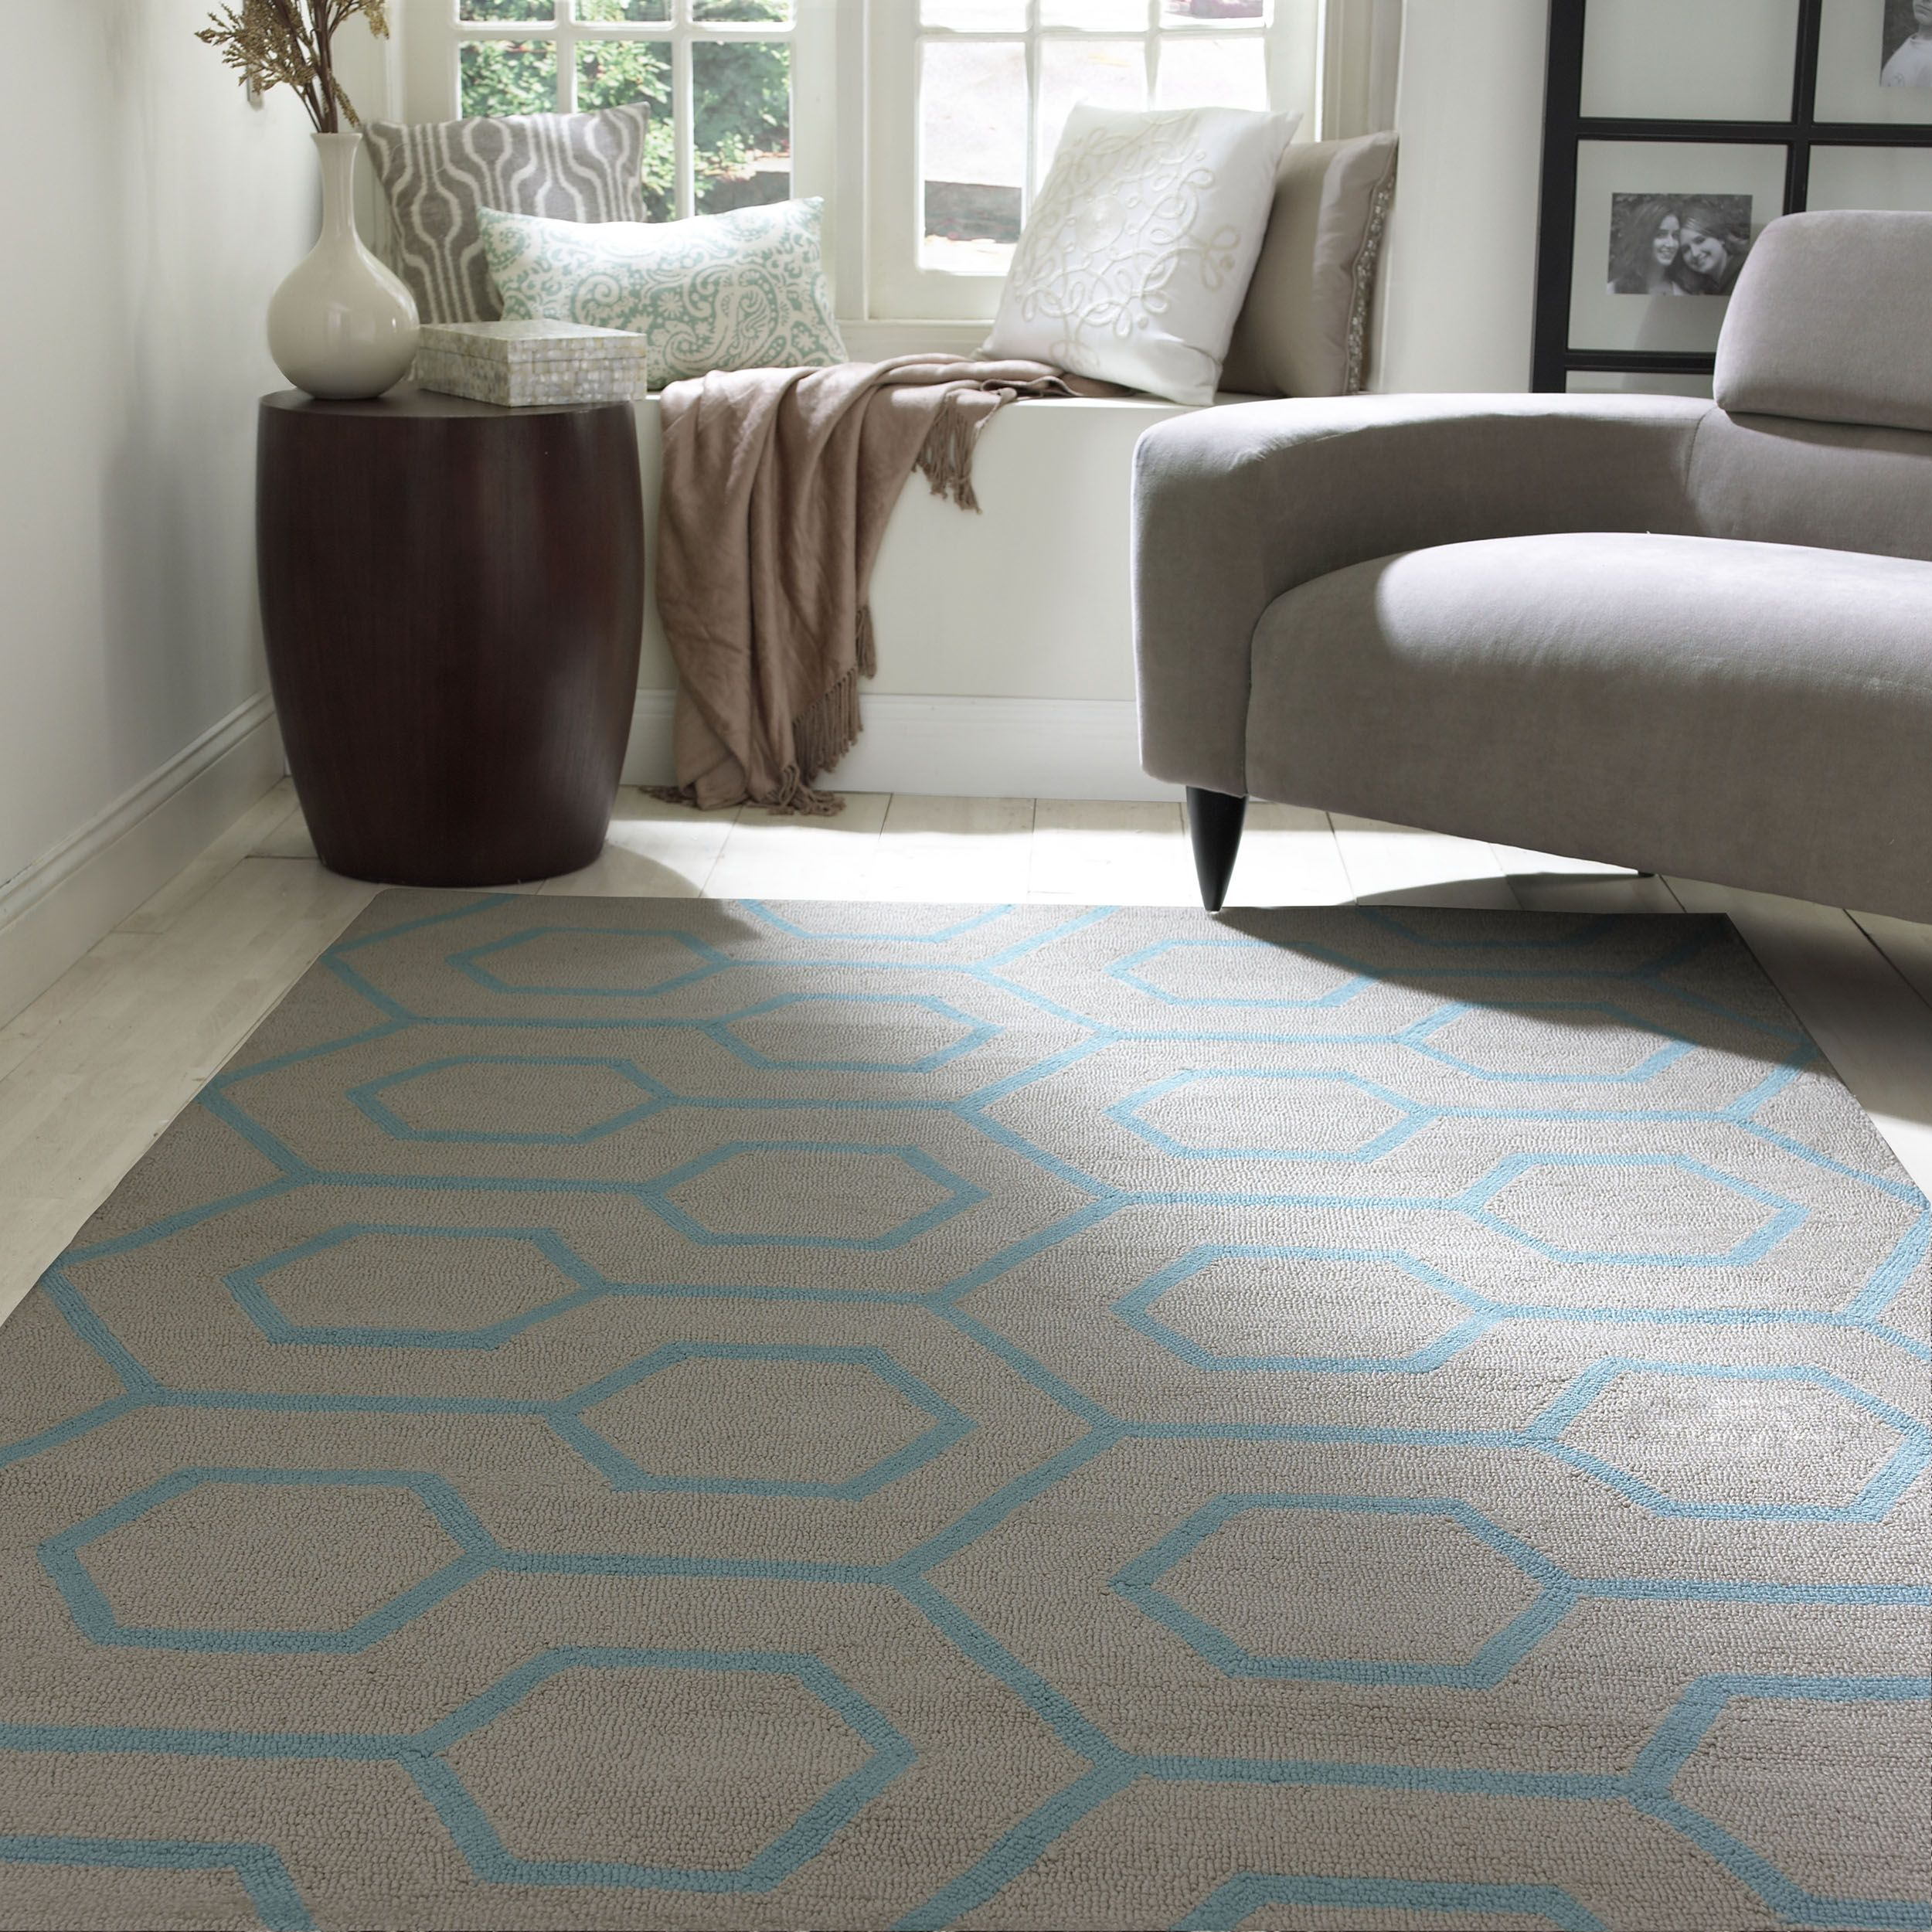 Rugs Usa Wool Area Rugs Www Rugsusa Com Home Decor Interior